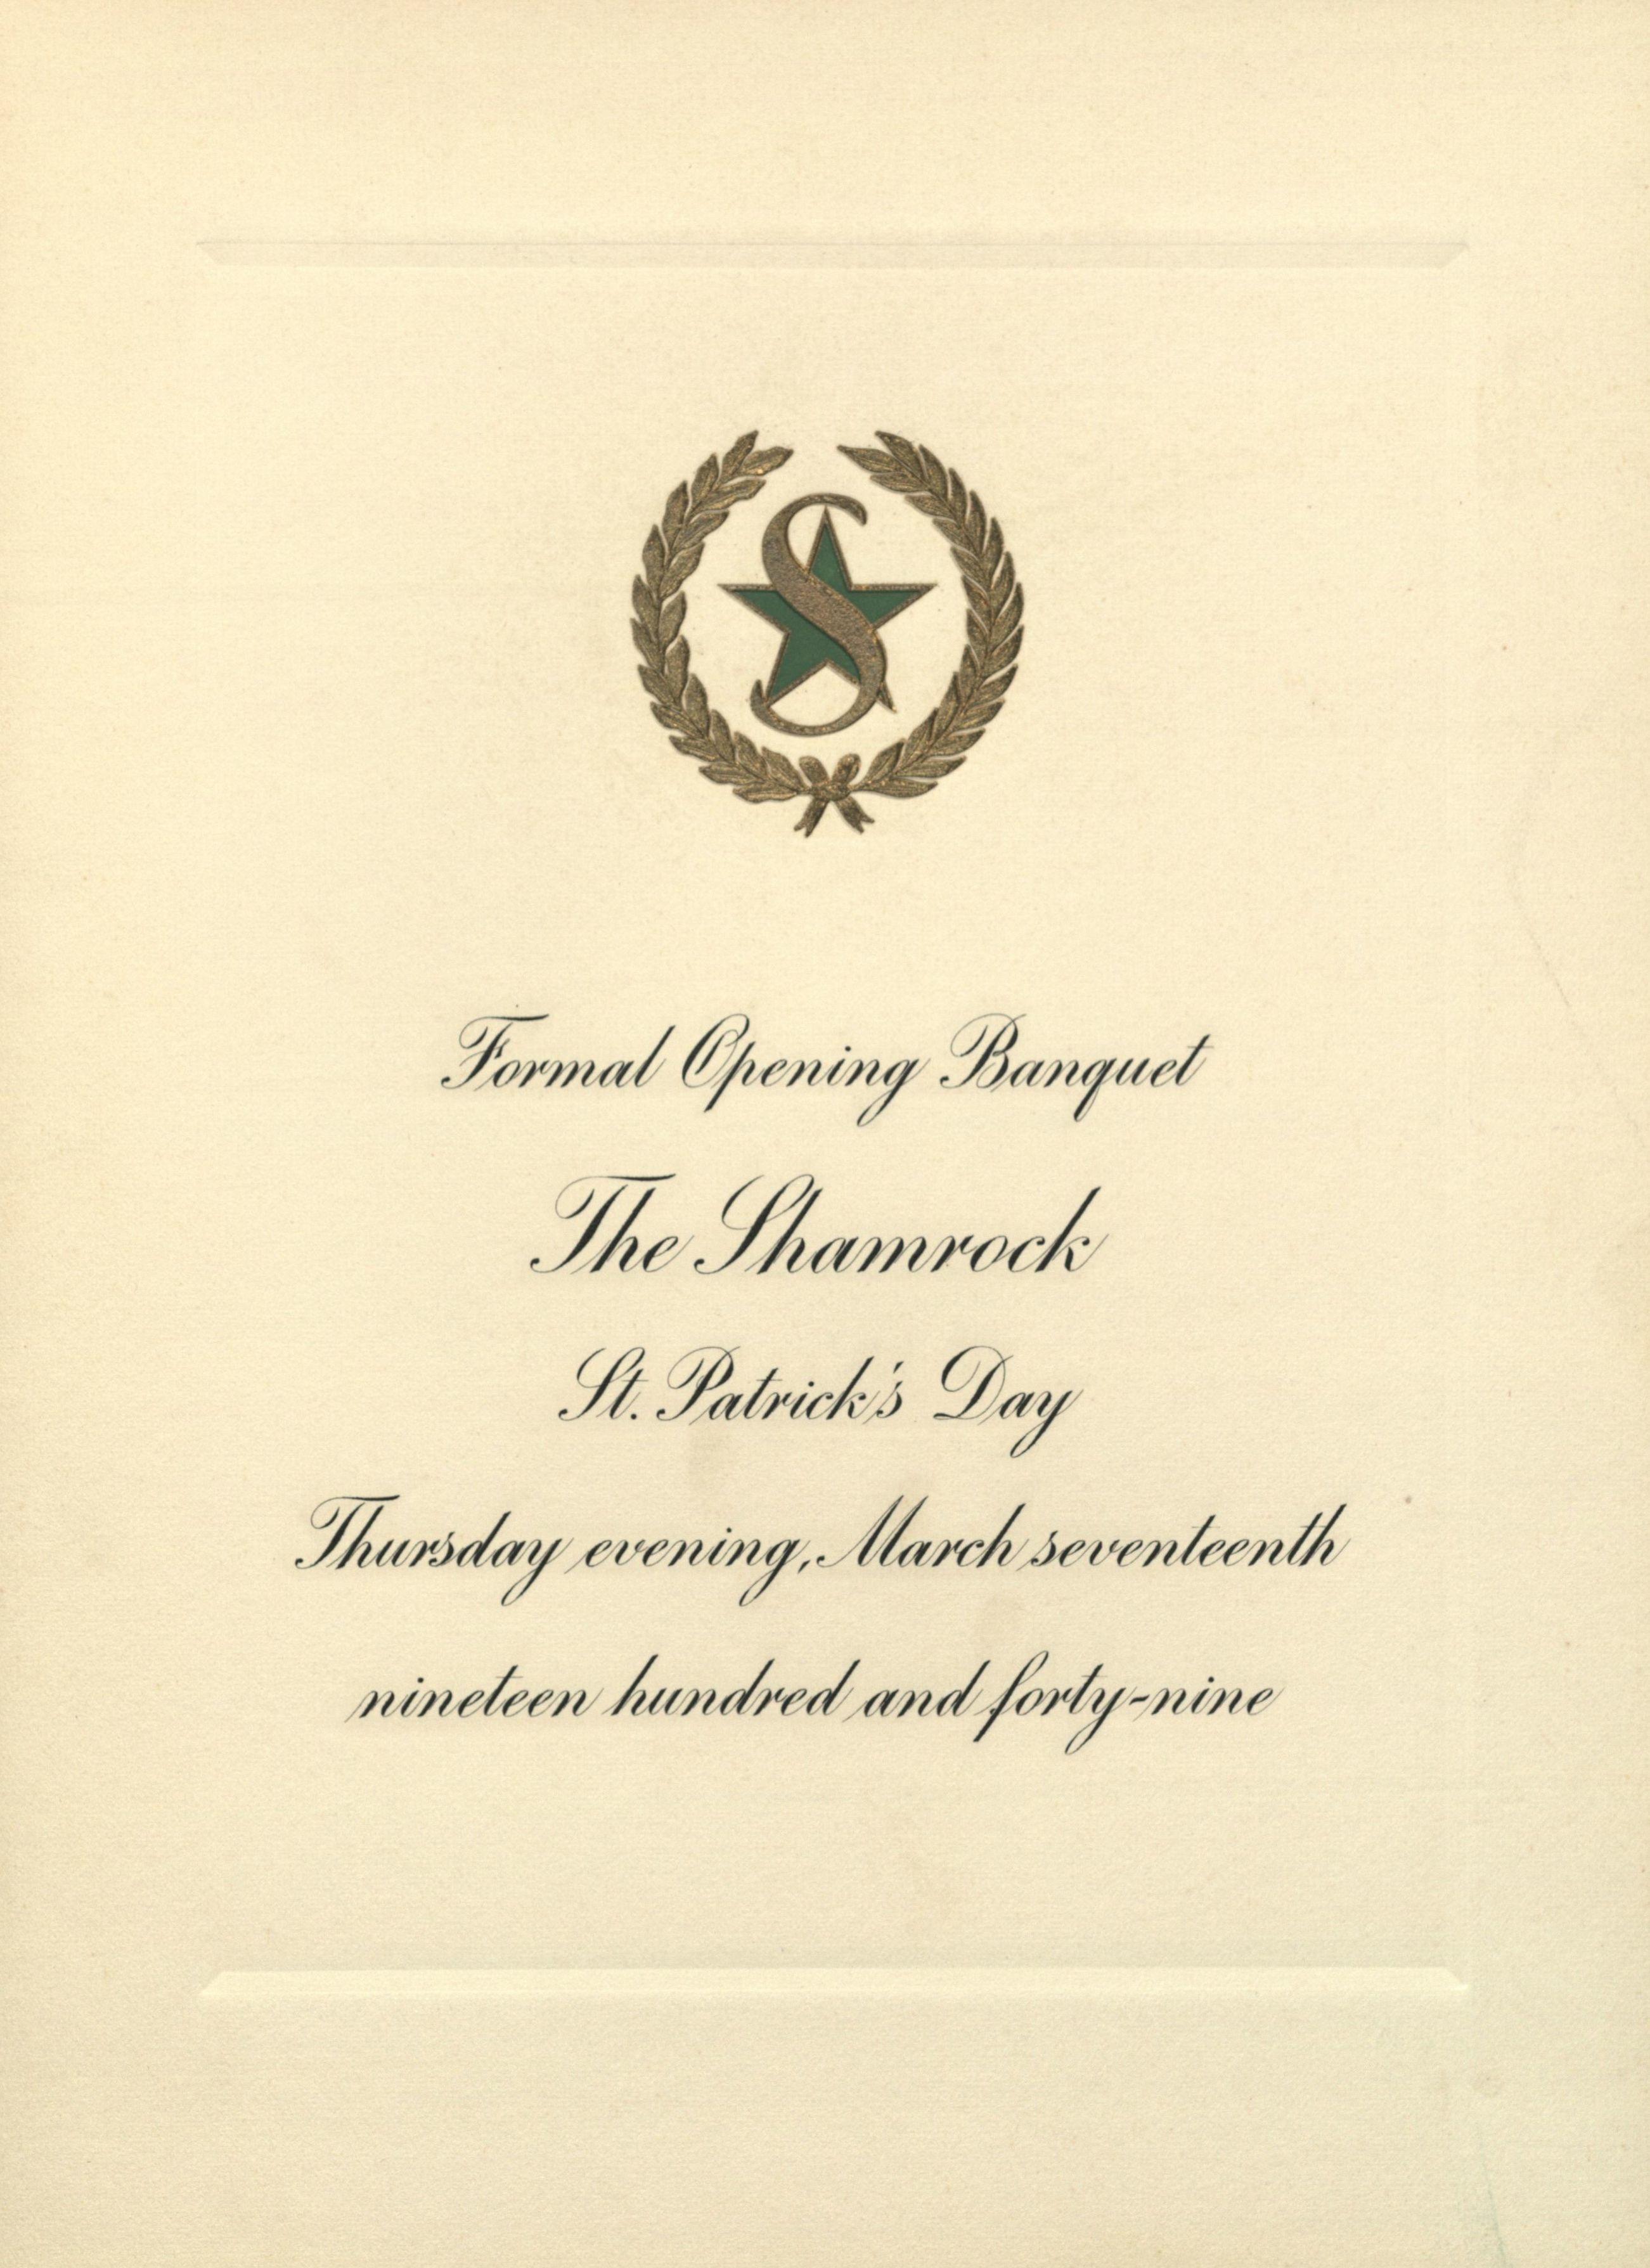 Opening gala invite for the Shamrock Hotel